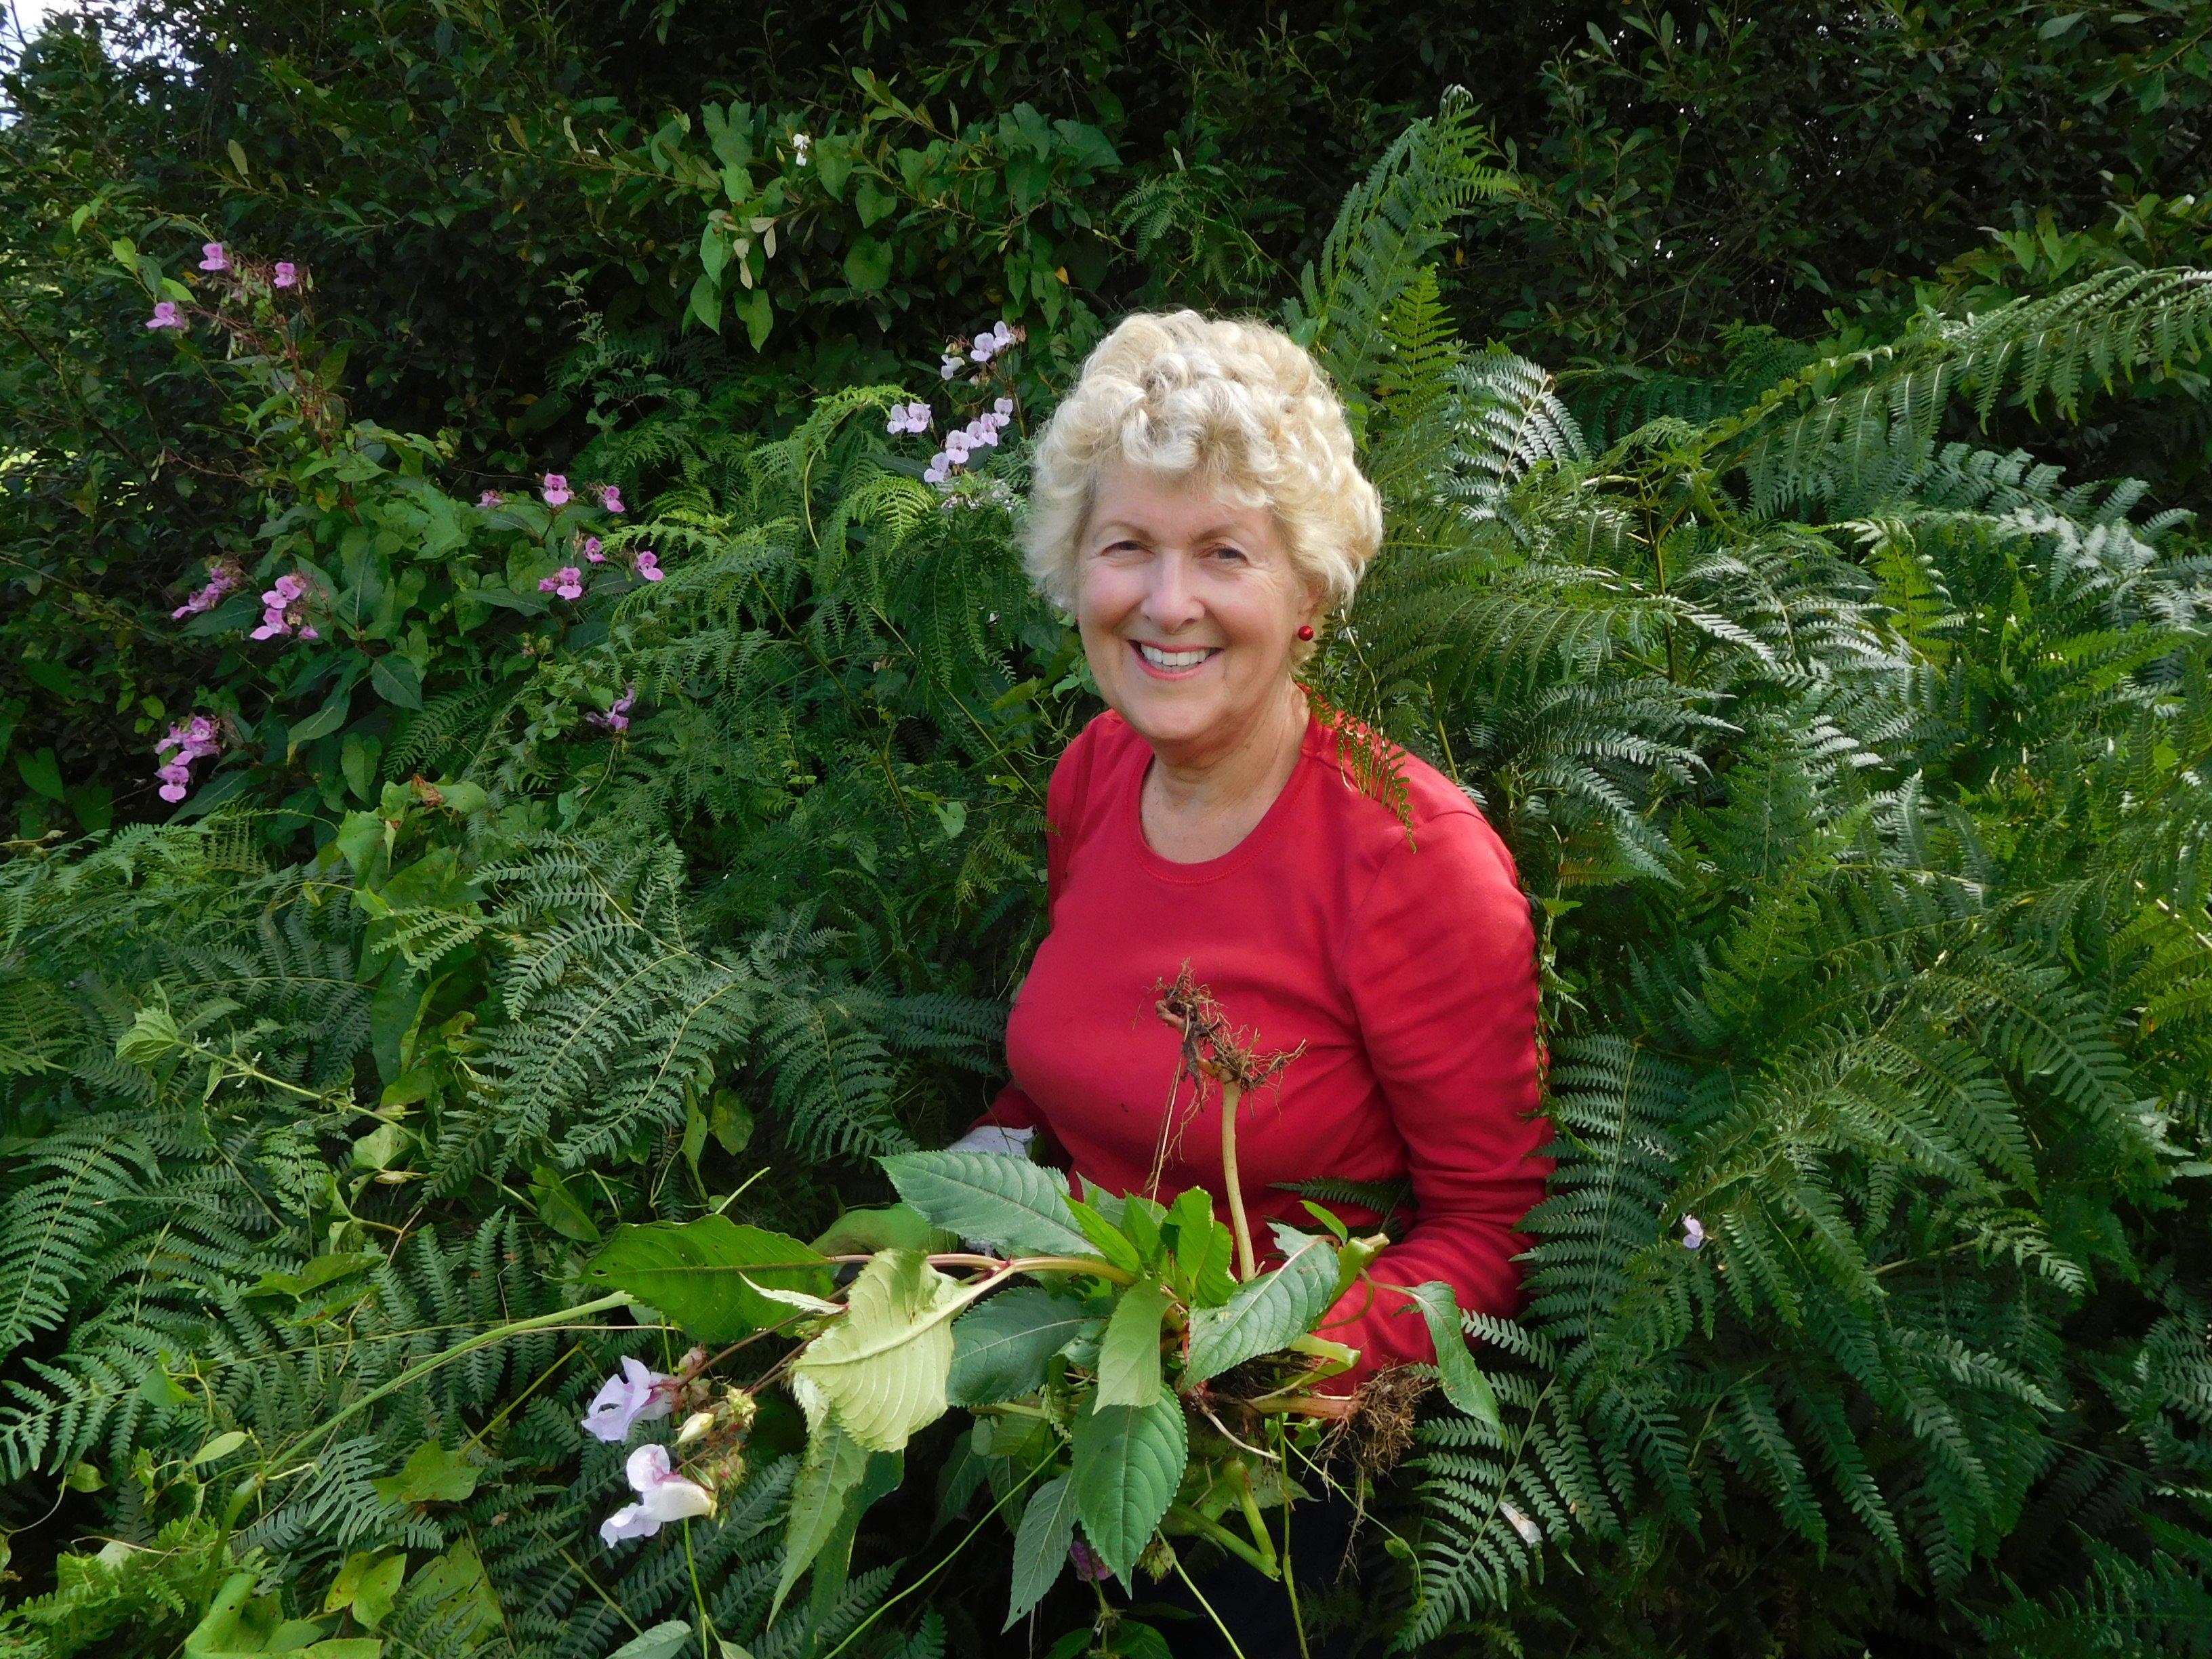 Volunteer Patsy Baverstock himalayan balsam pulling